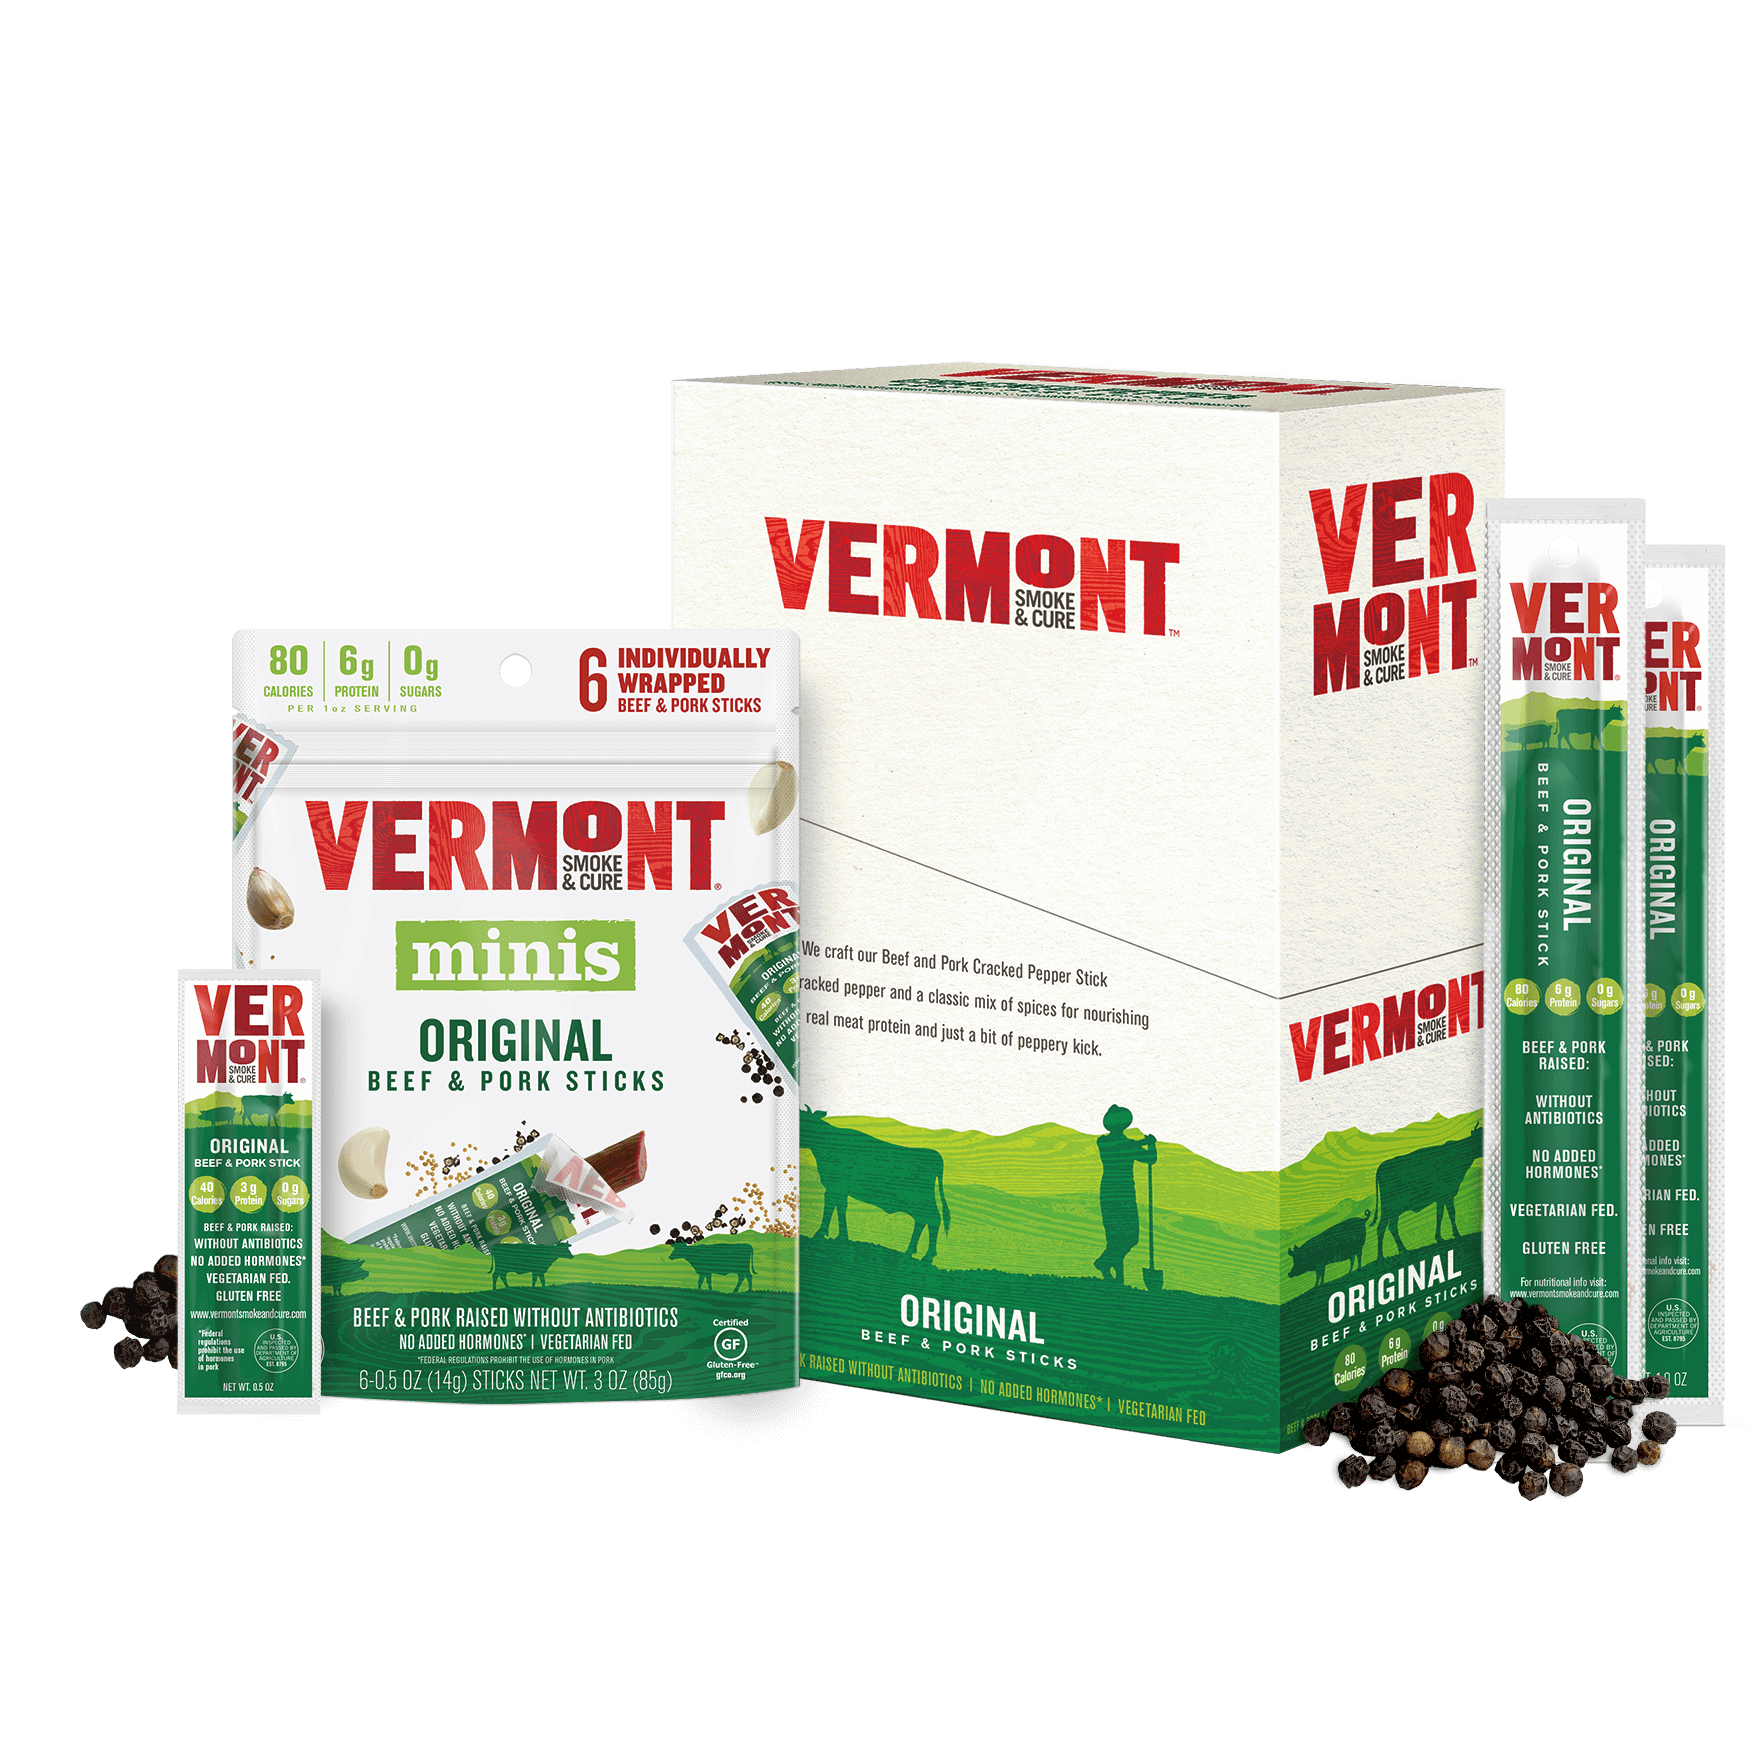 Vermont Smoke & Cure Original Beef & Pork Sticks